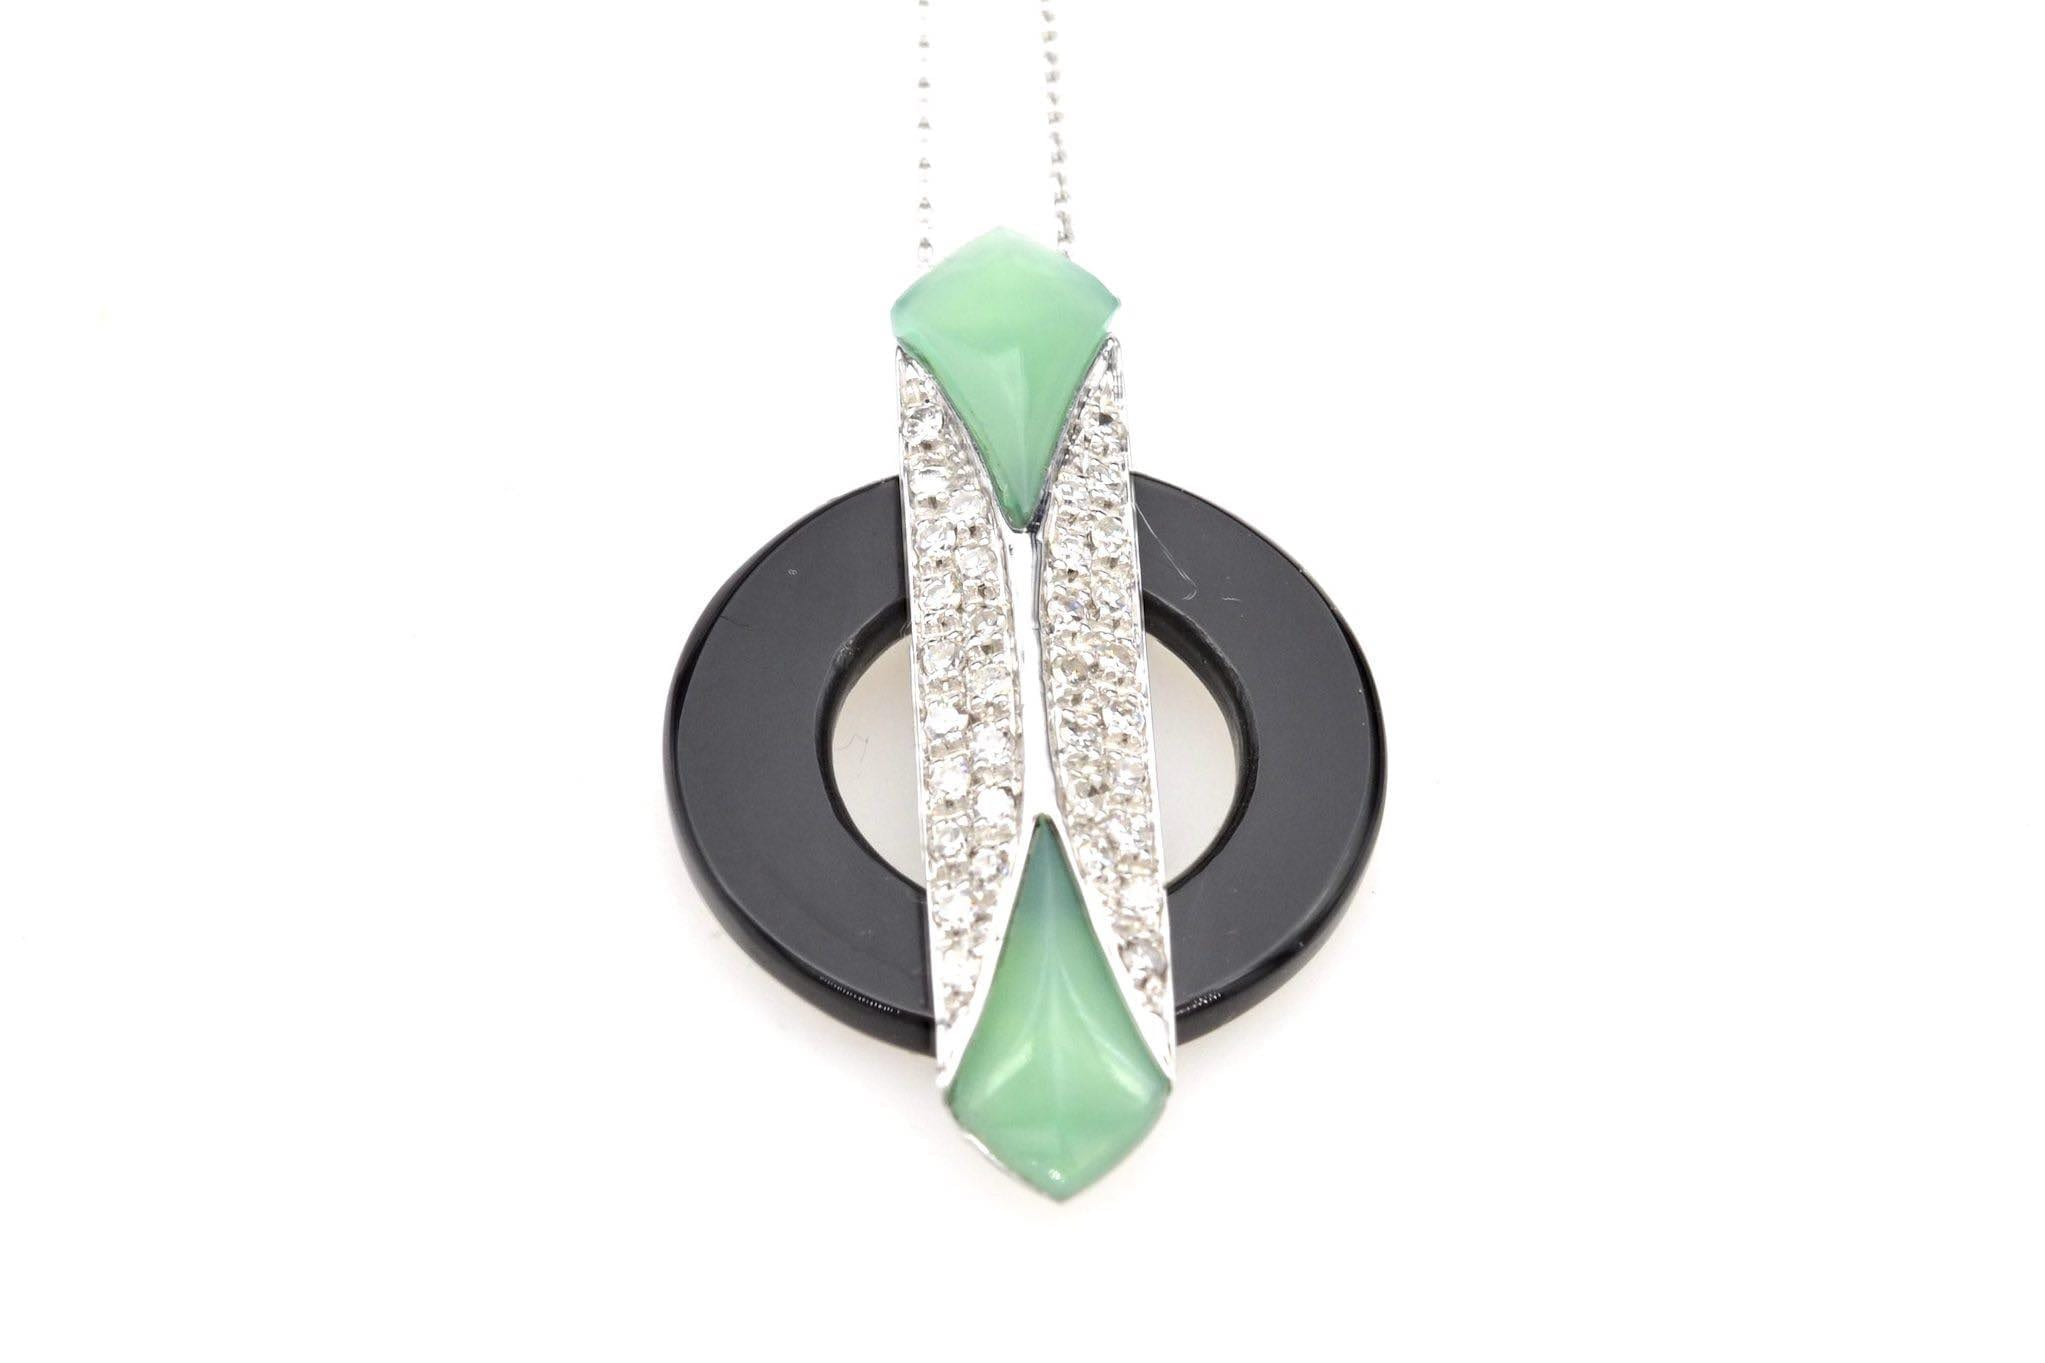 Collier pendentif jade onyx et diamants en or blanc 18k